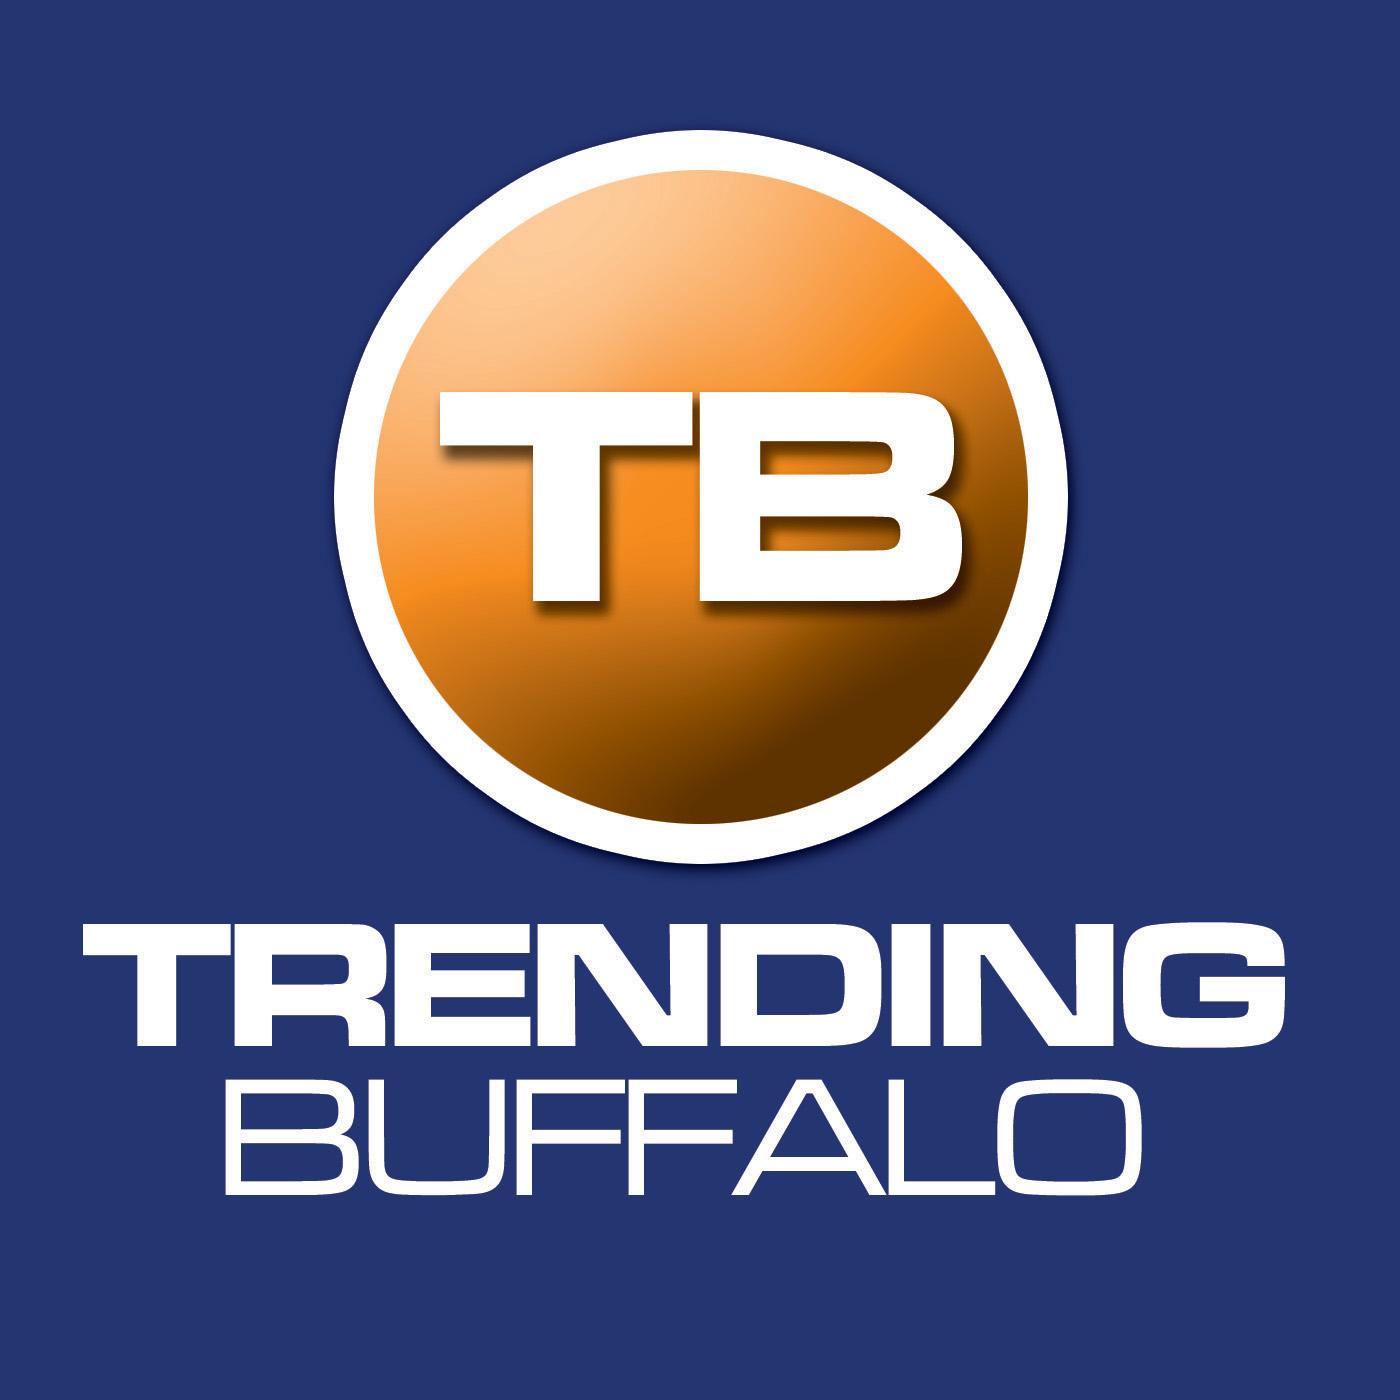 Trending Buffalo